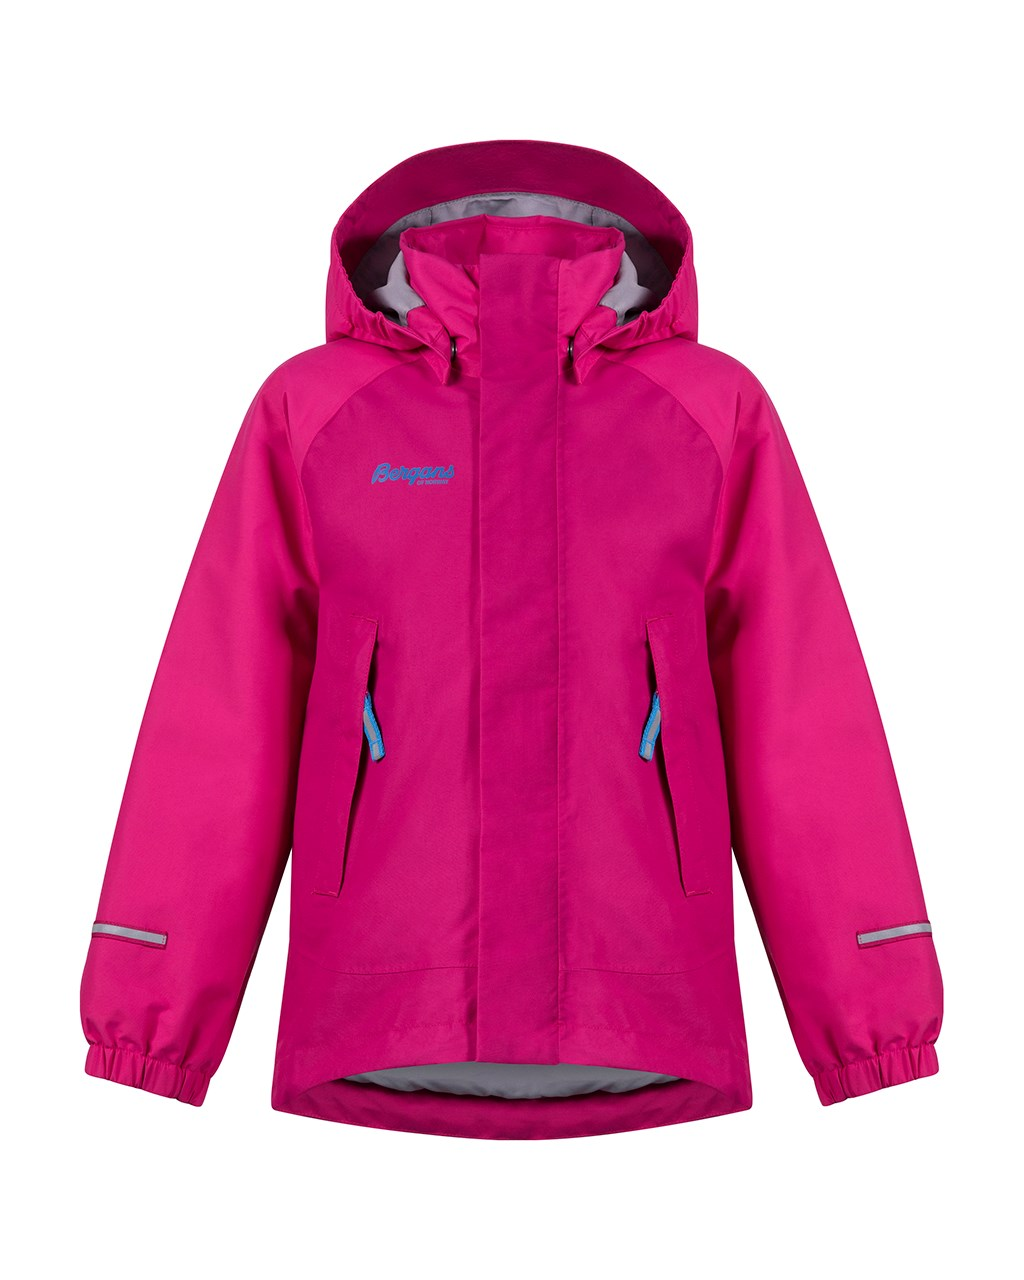 7ee4b0e4 Storm Insulated Kids Jacket Cerise/Hot Pink/Light Winter Sky